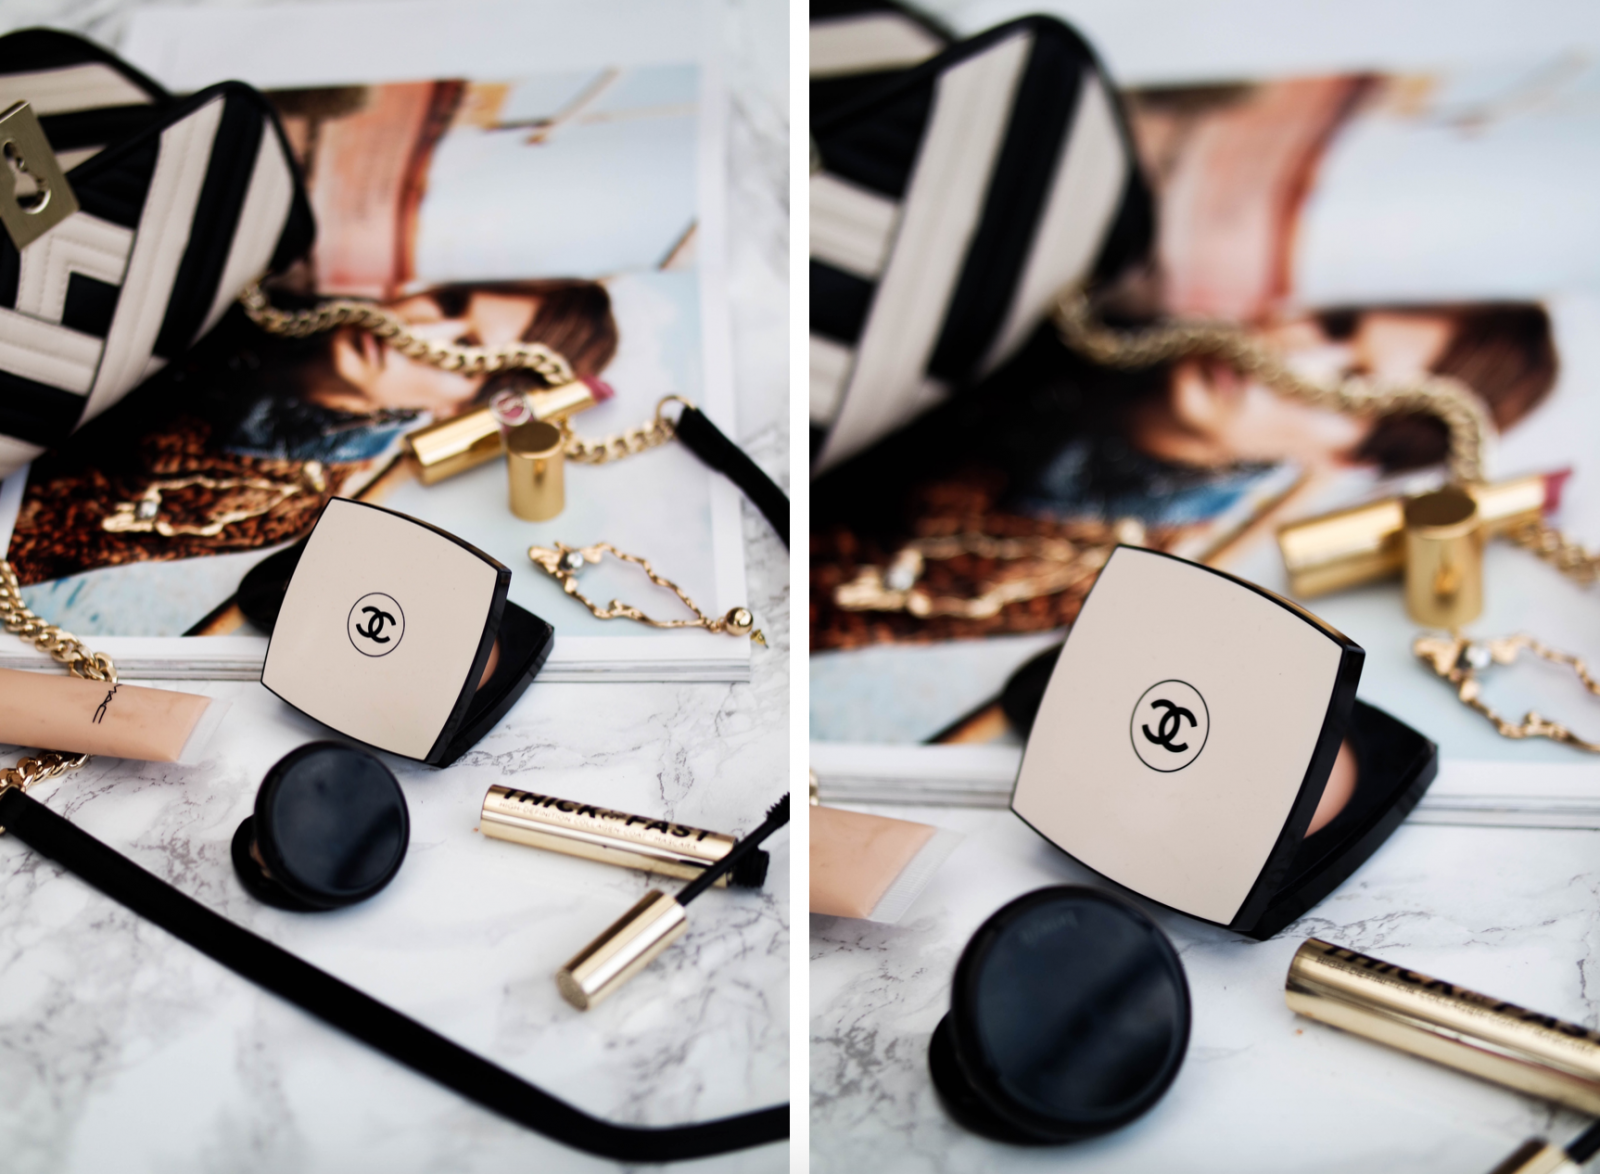 In My Make Up Bag Chanel Les Beiges